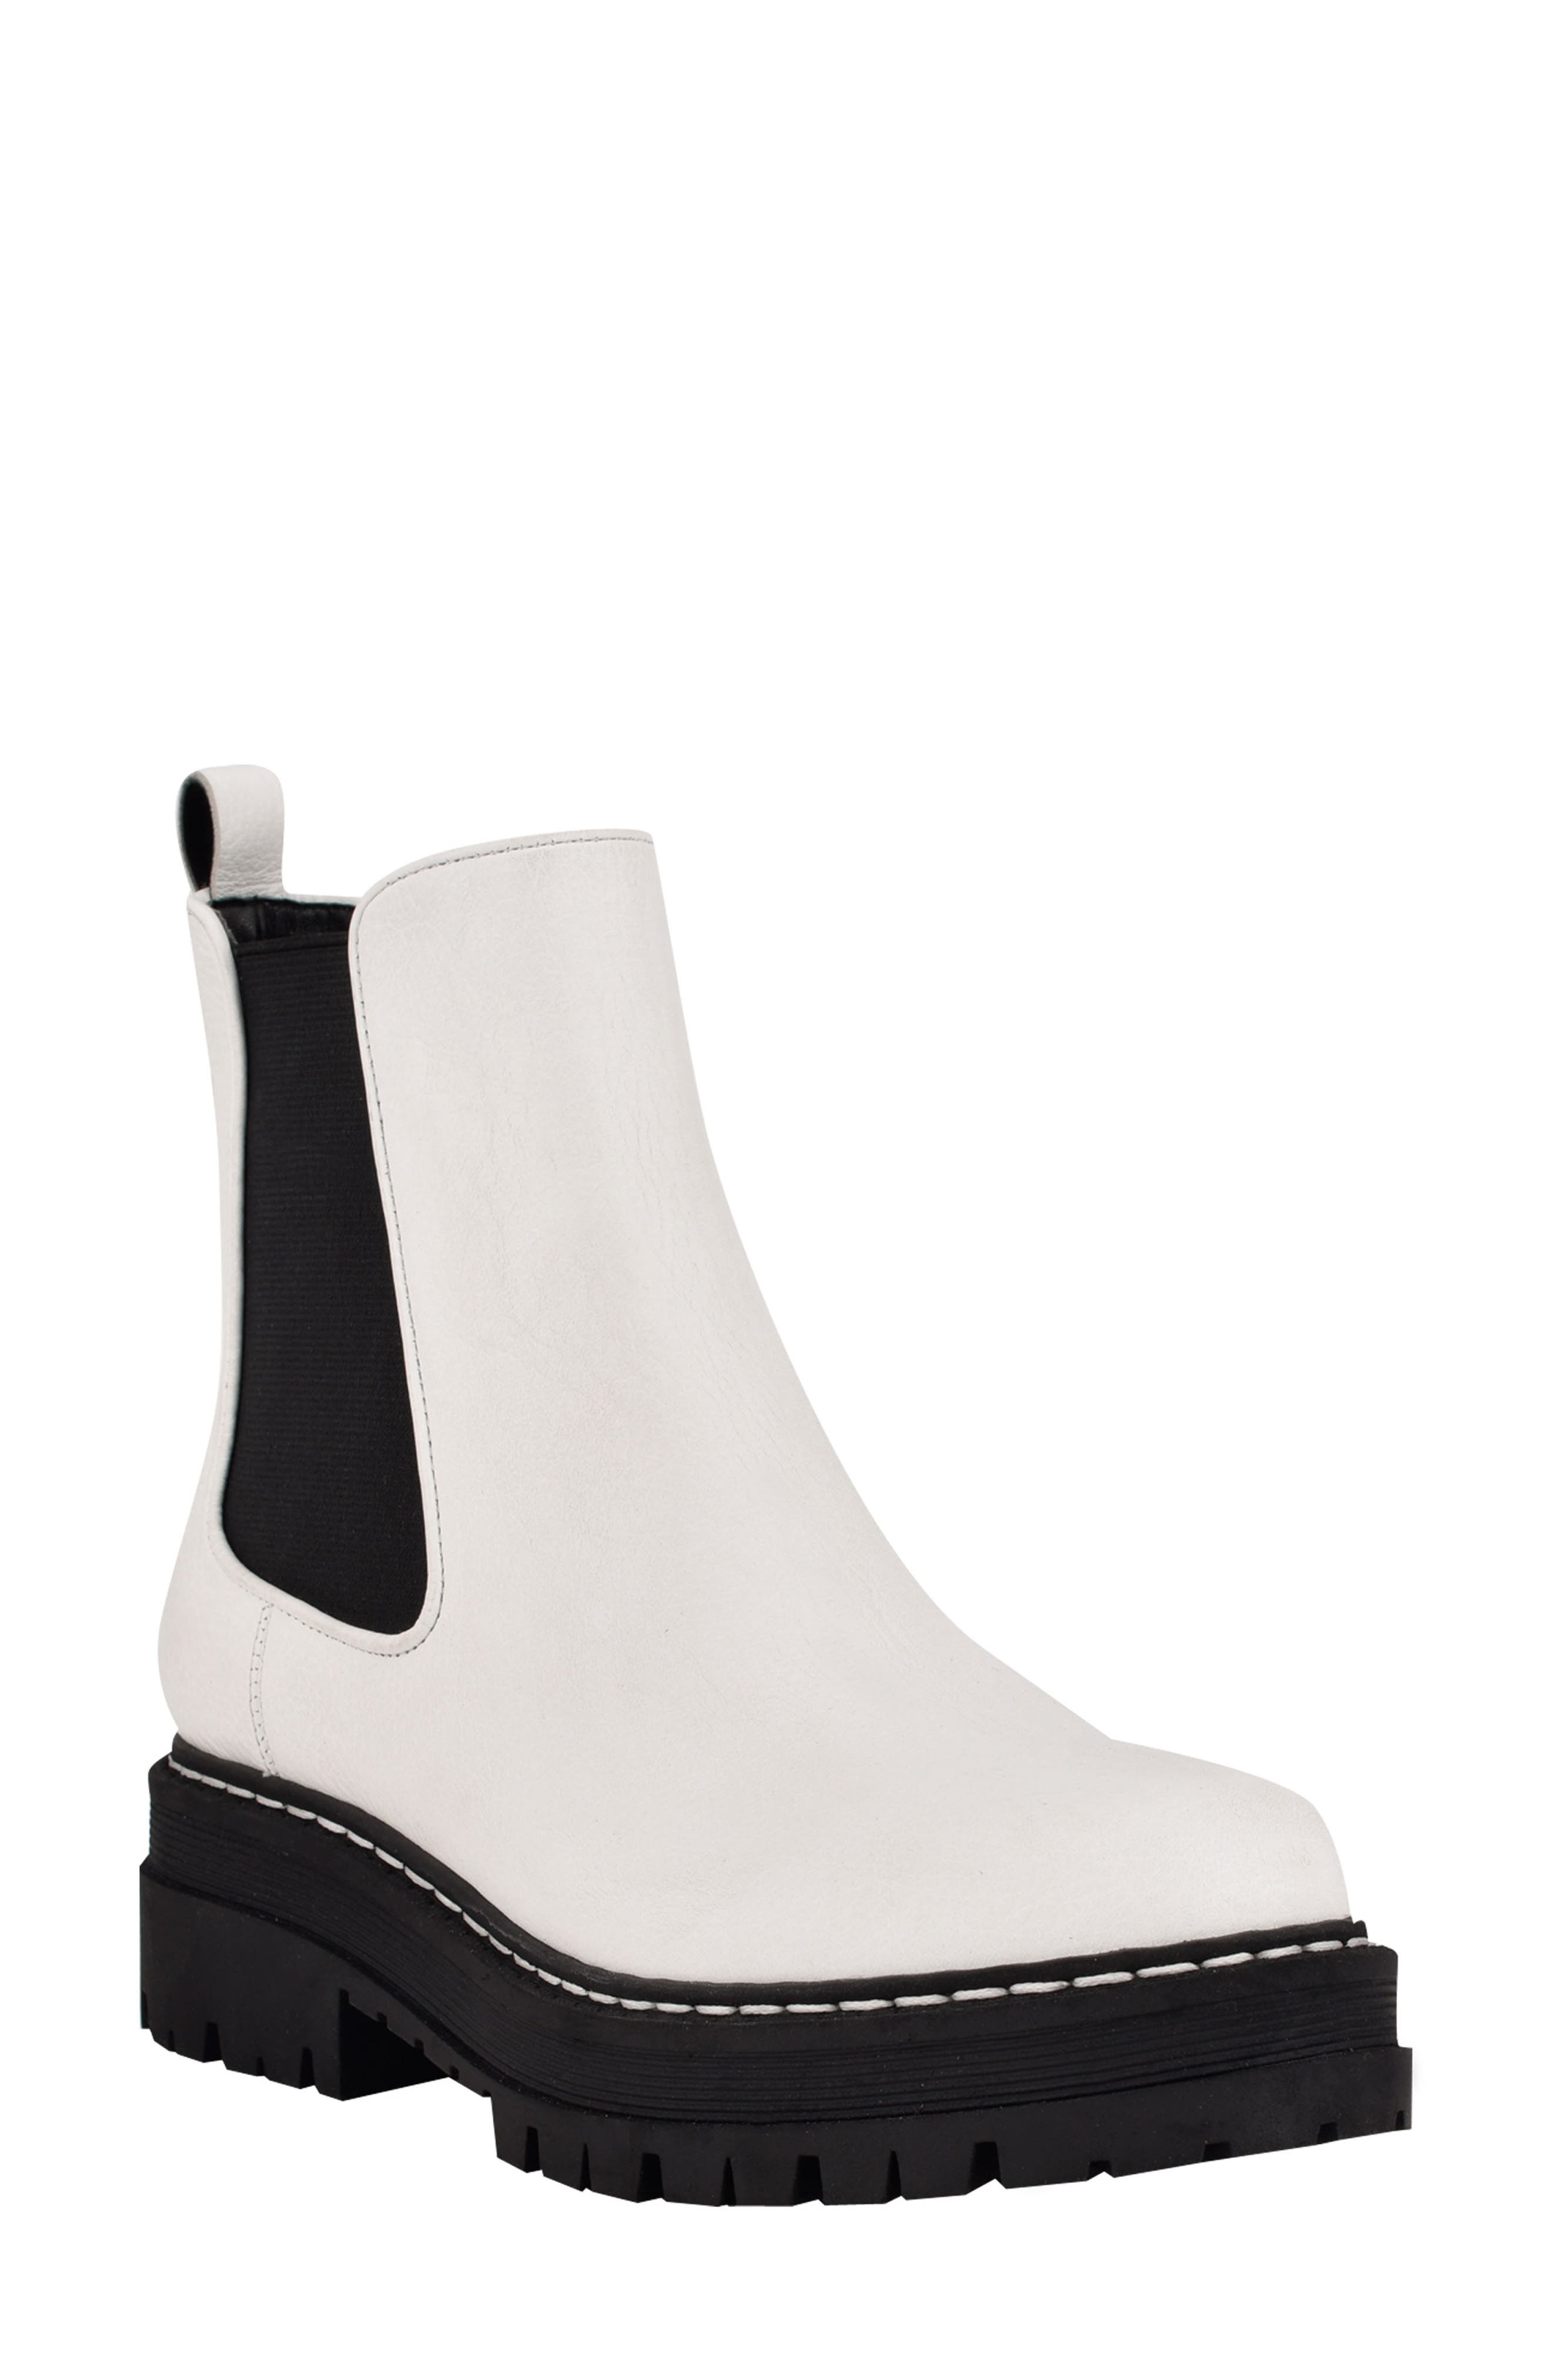 Privi Platform Chelsea Boot